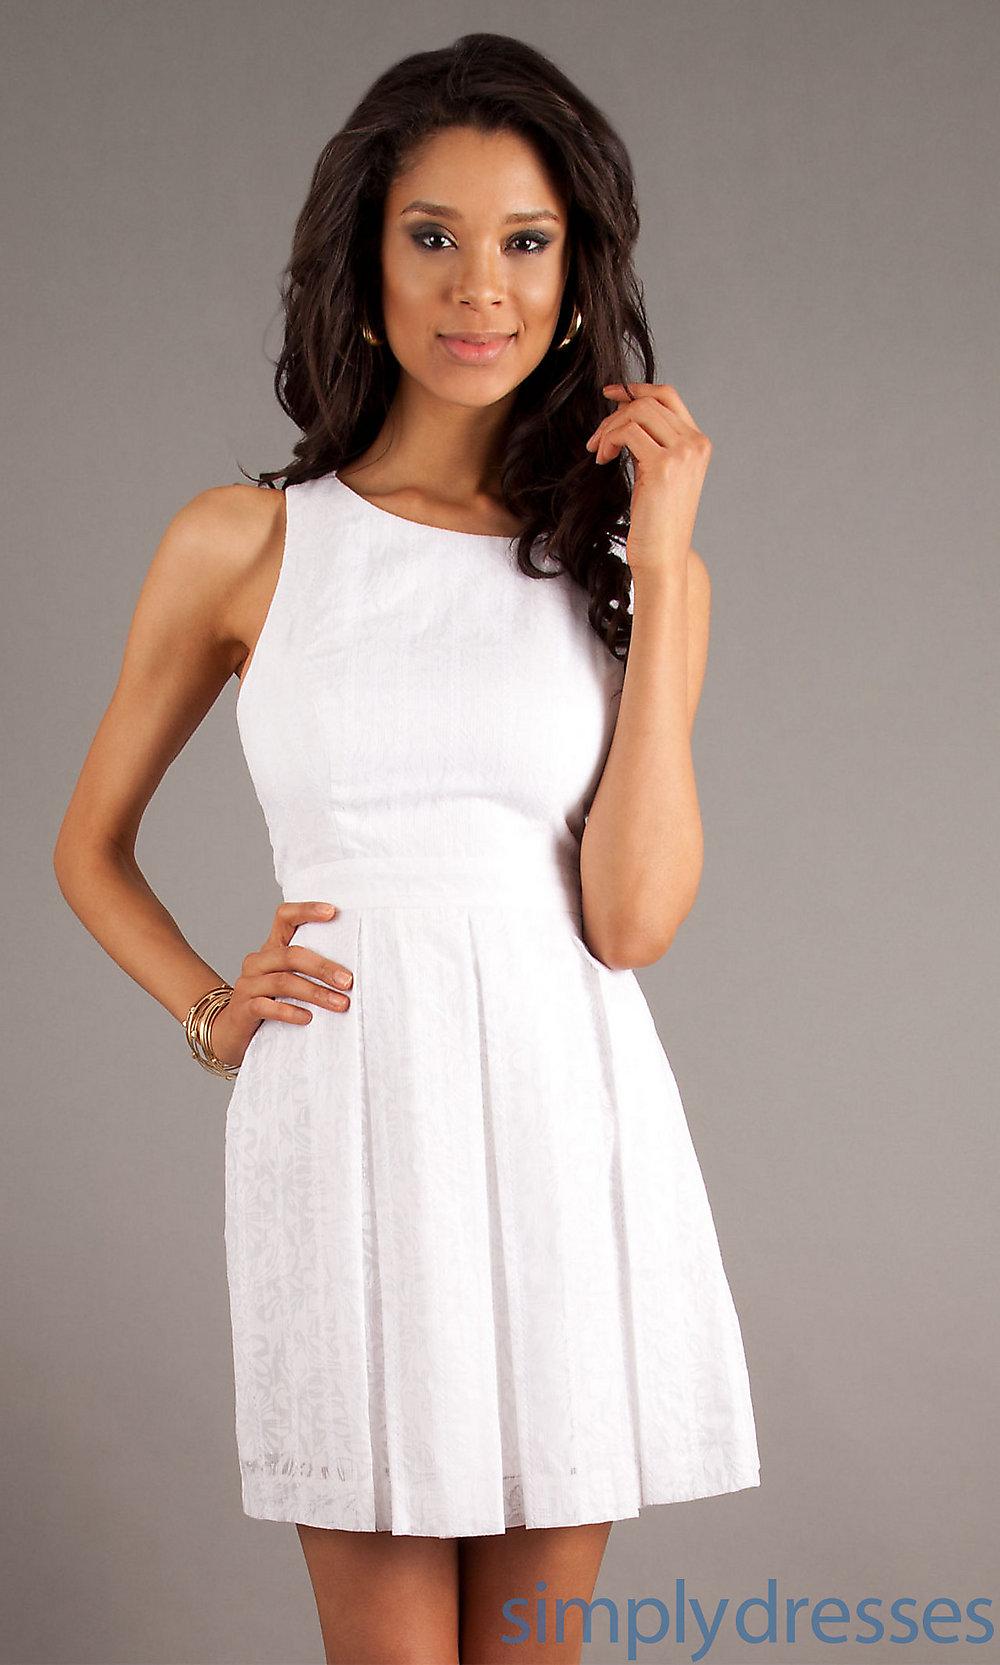 graduation-white-dresses-srxupw4c.jpg